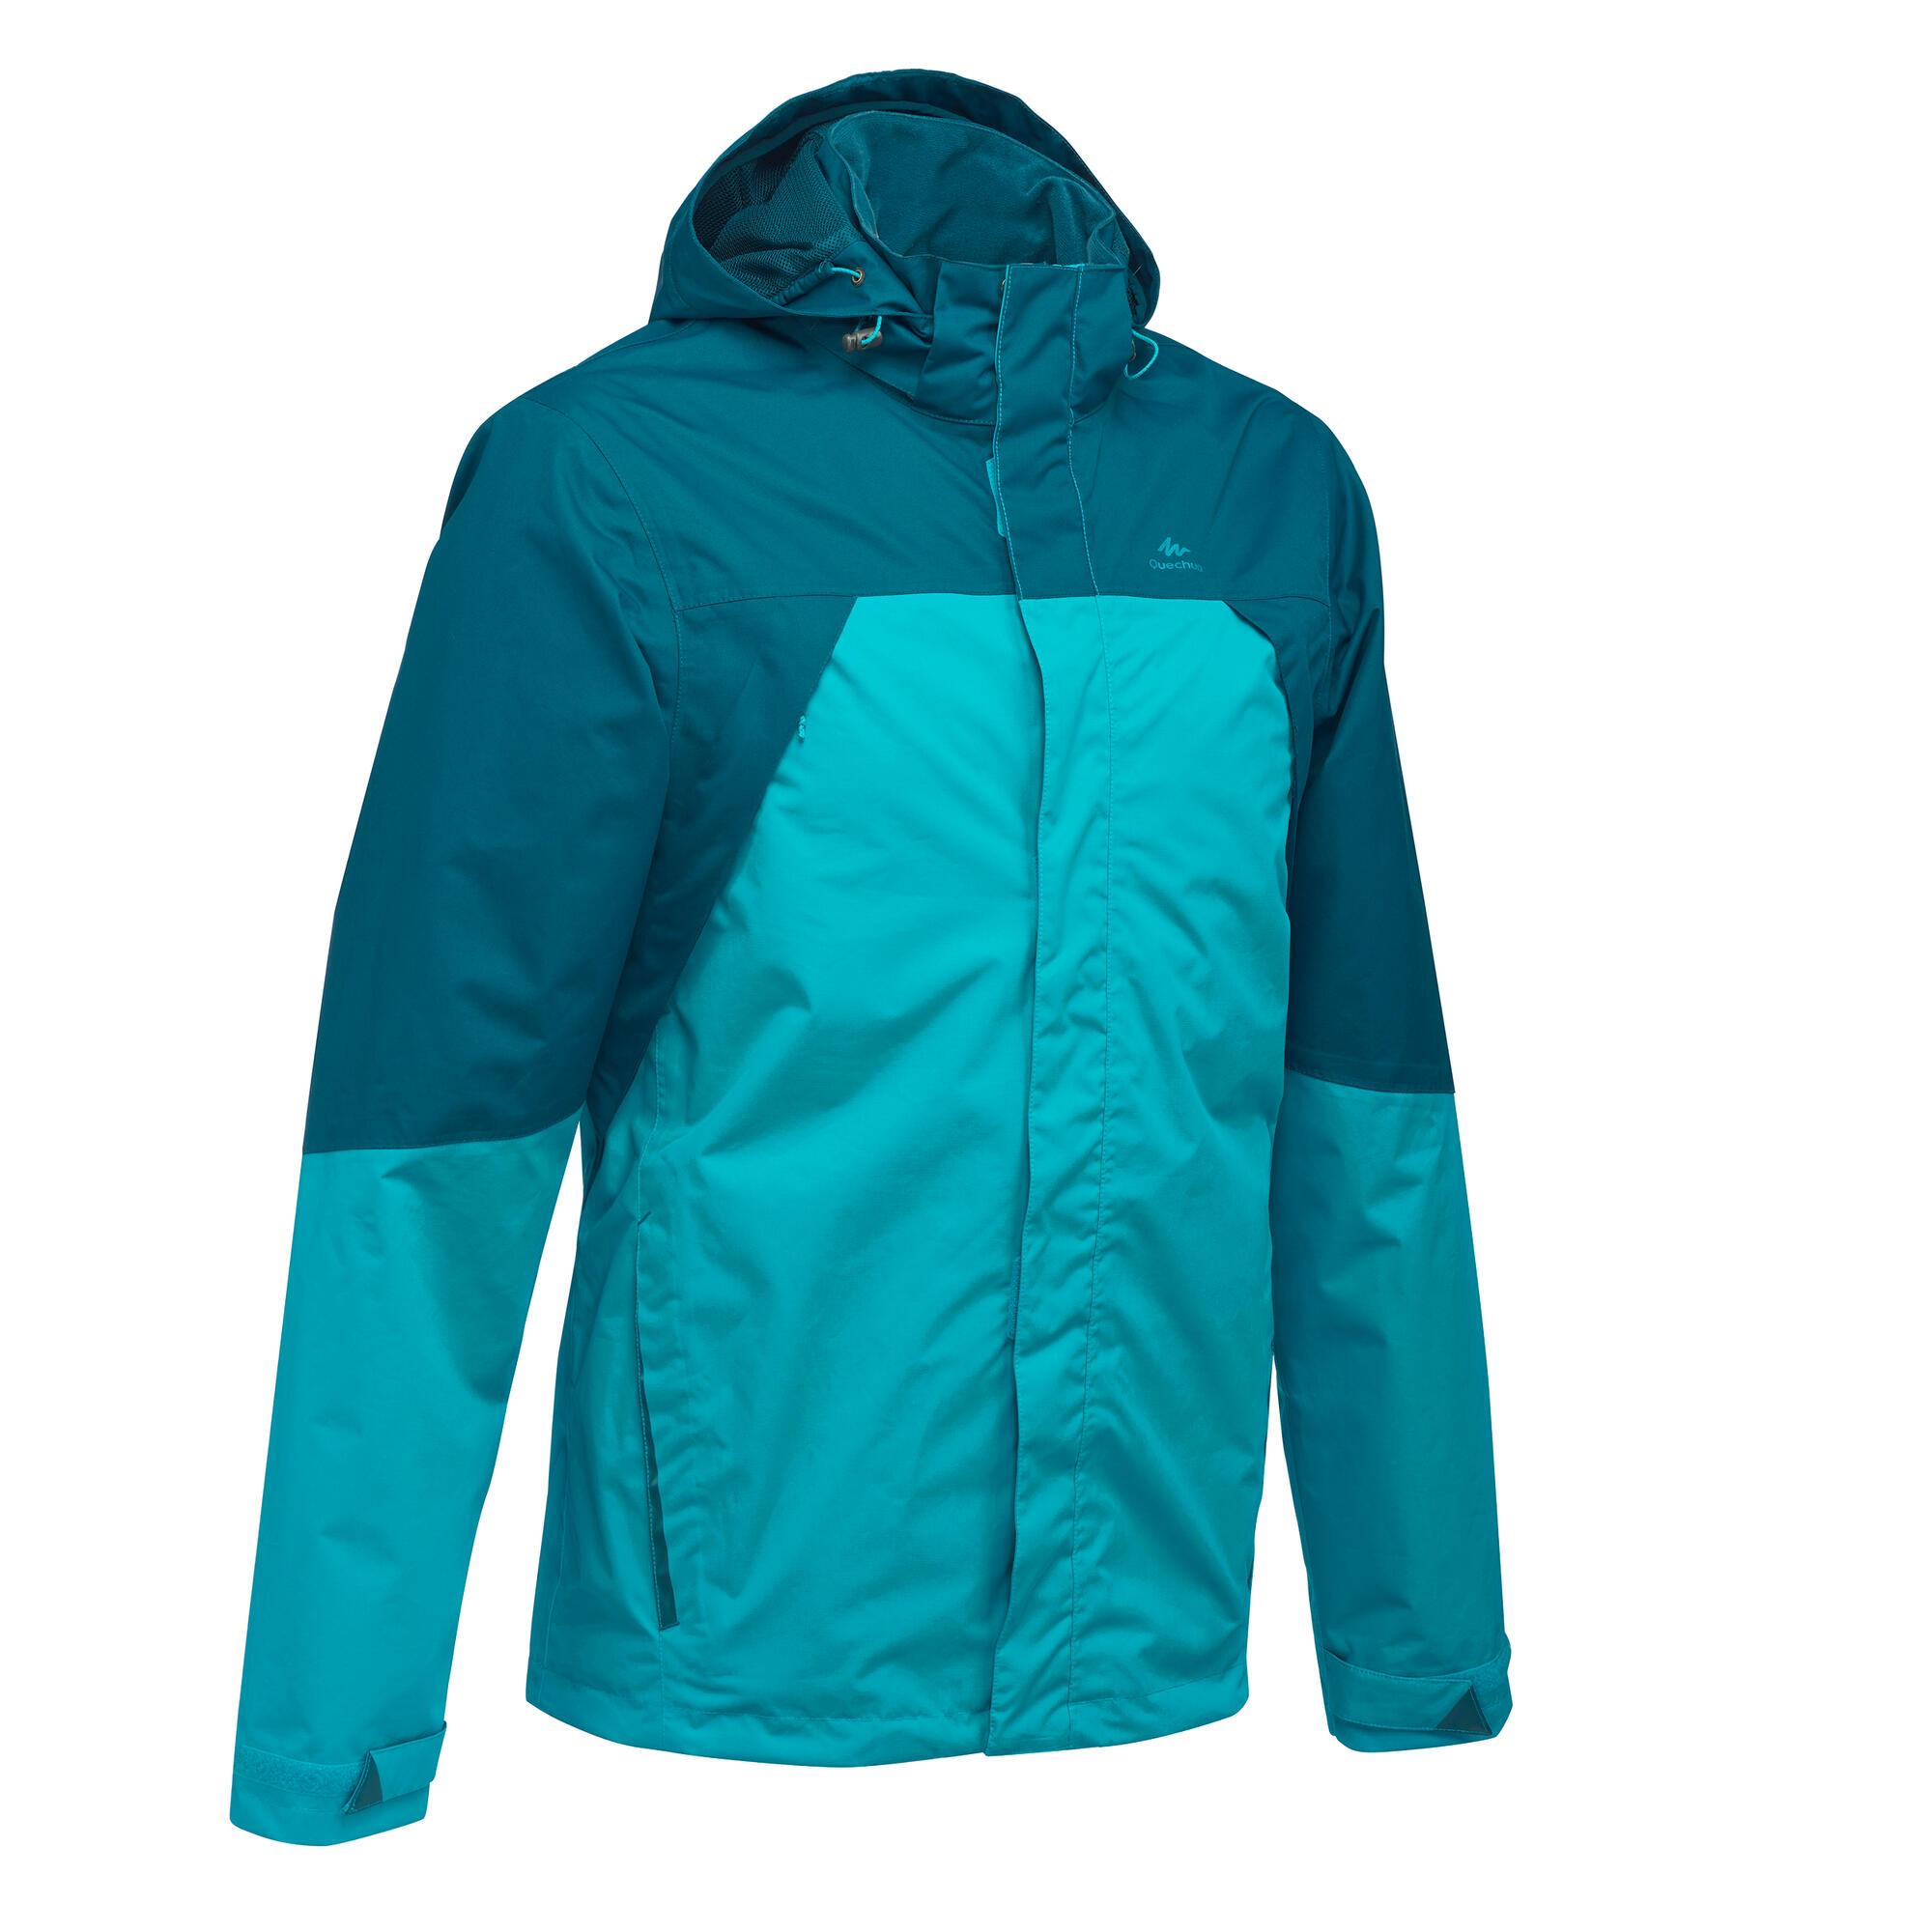 Mh100 Men S Waterproof Mountain Hiking Rain Jacket Blue